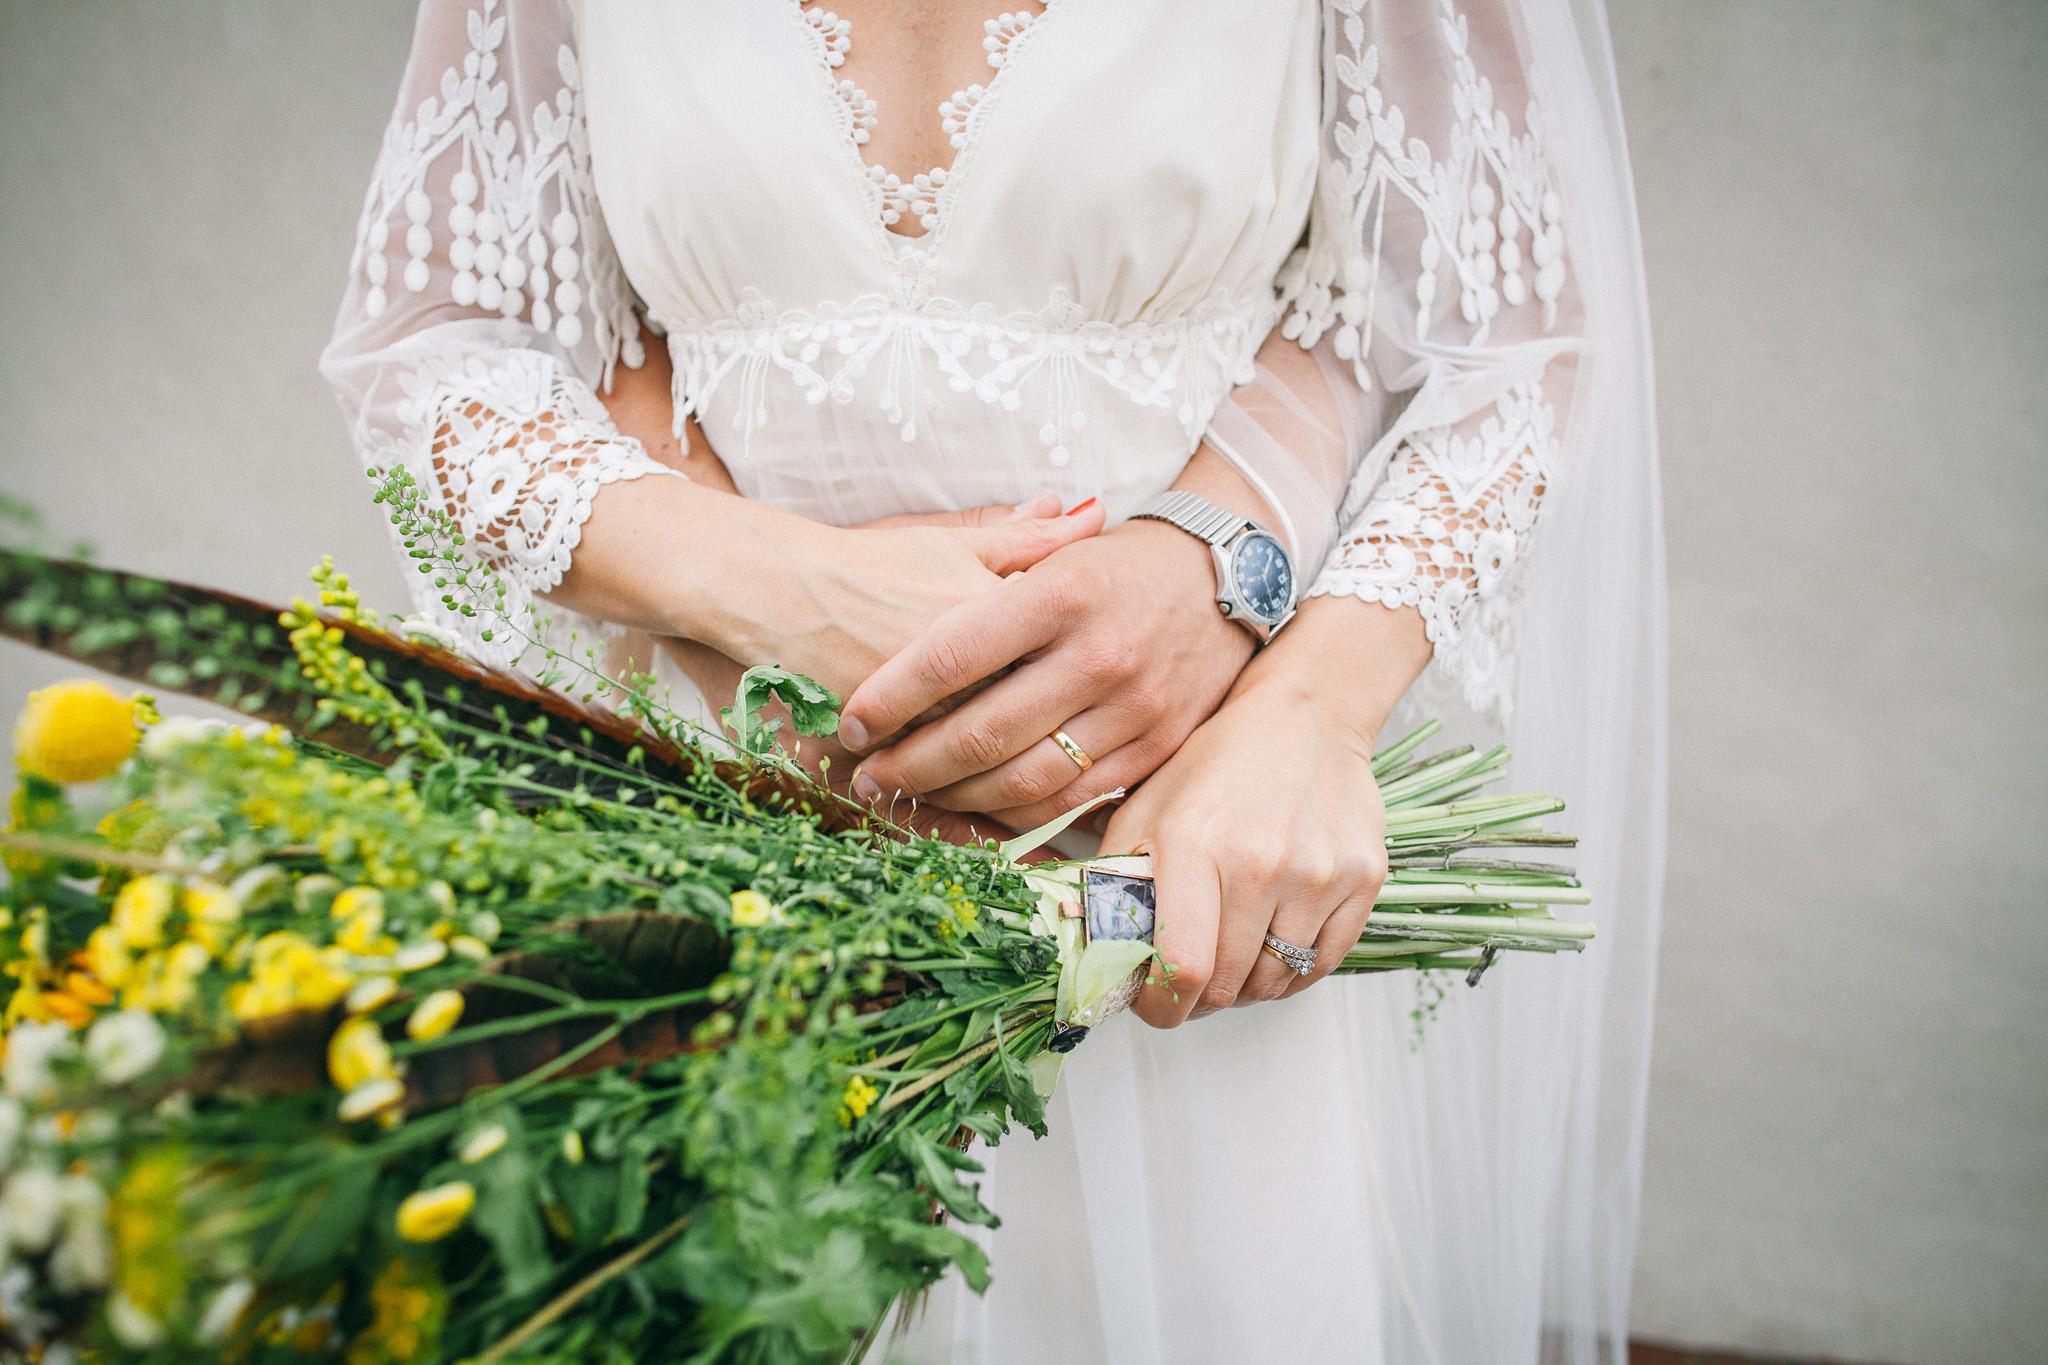 chantry_sussex_barn_wedding_332.jpg